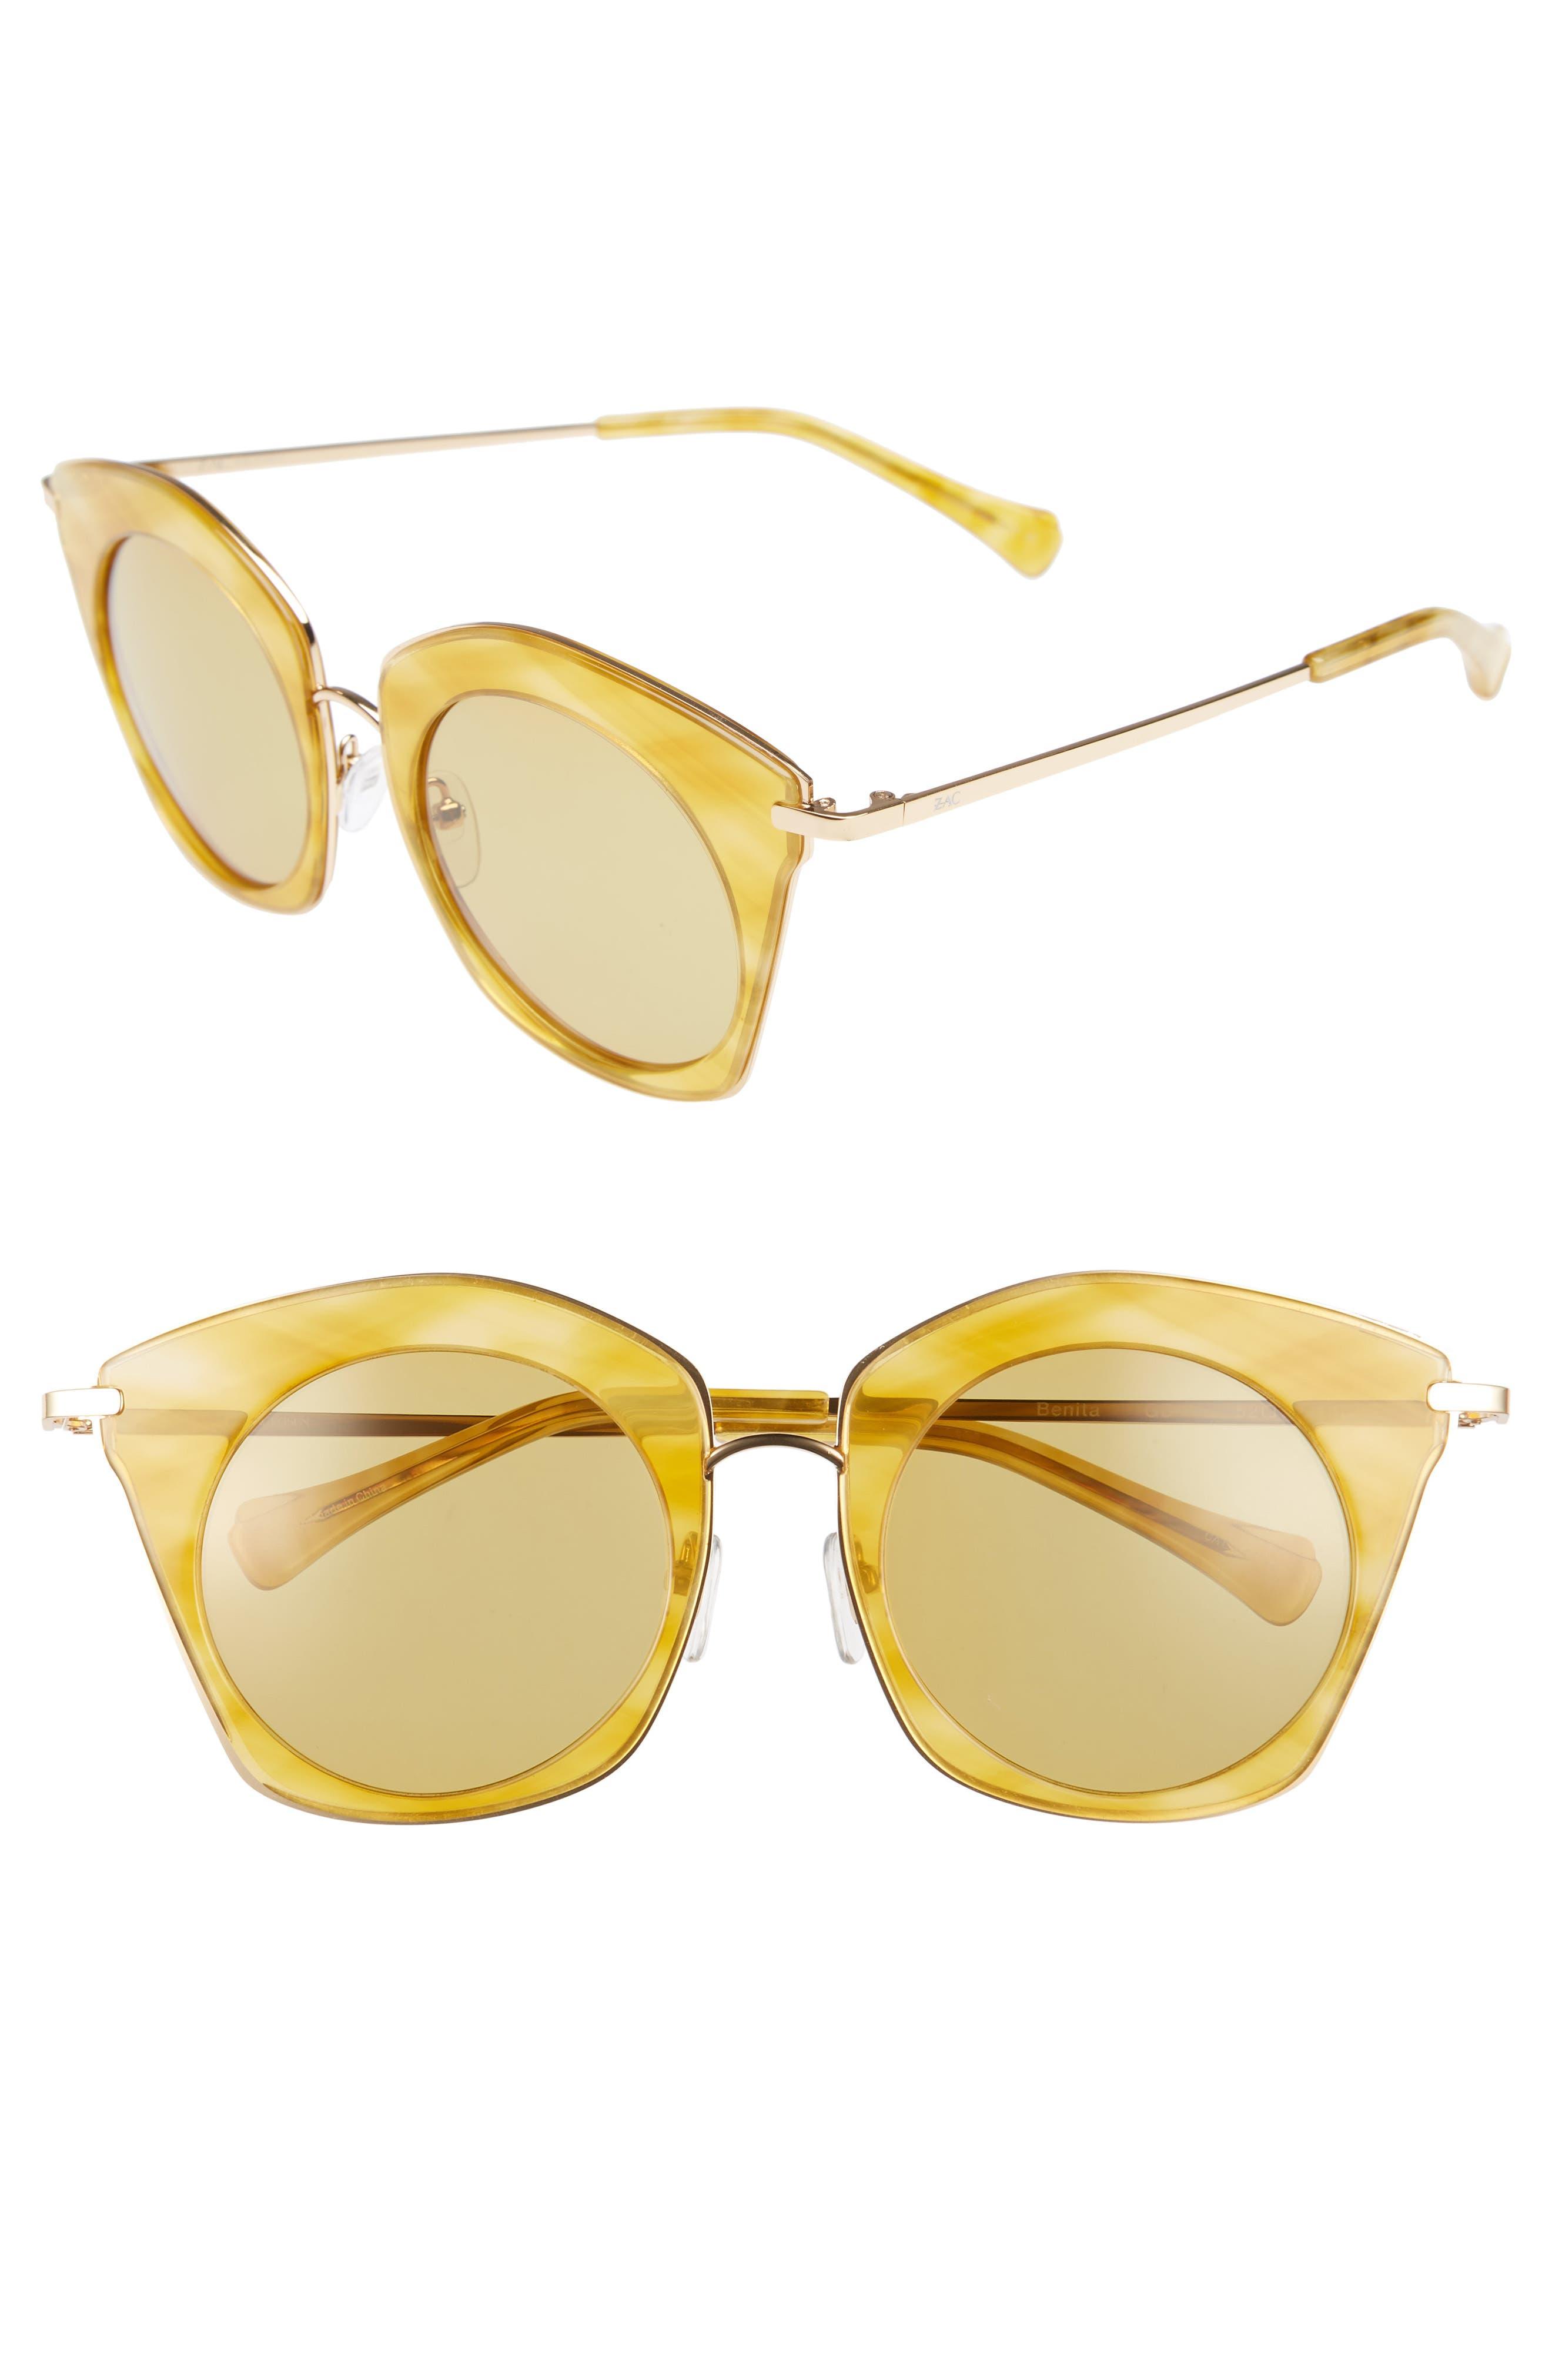 Benita 52mm Polarized Sunglasses,                         Main,                         color, Gold Polar